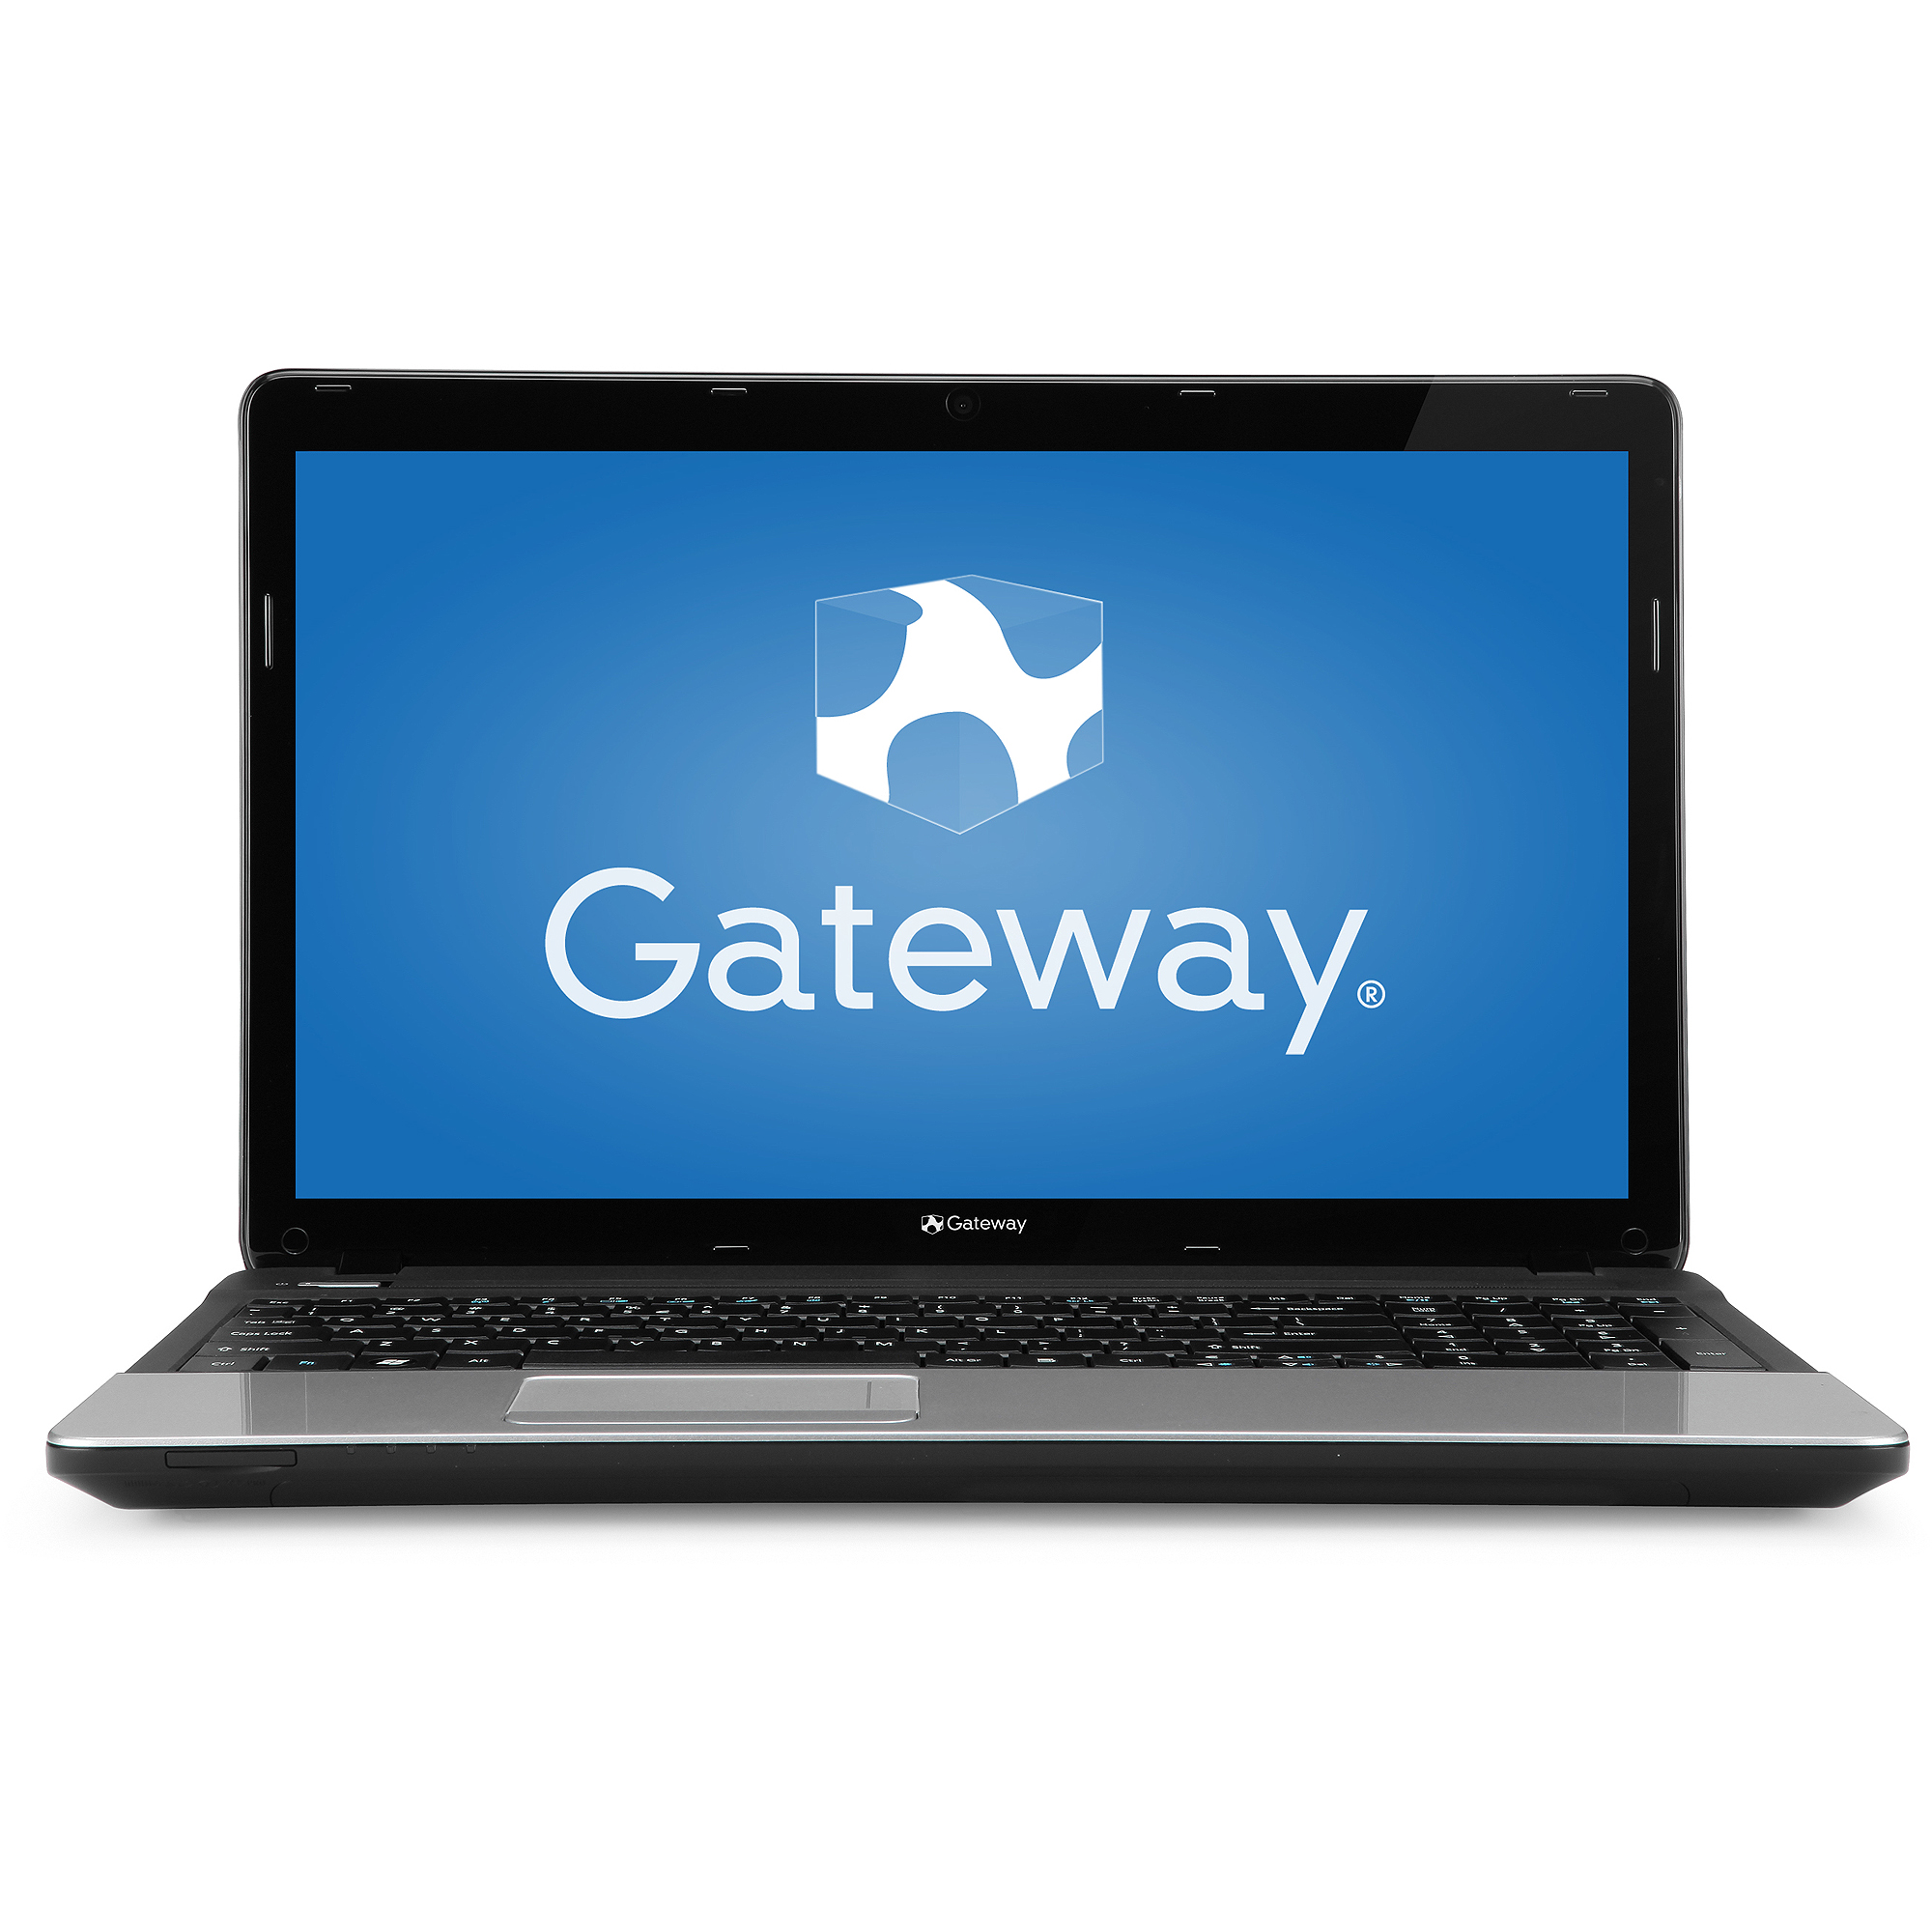 "Gateway 15.6"" NE56R31u Laptop PC with Intel Celeron B830 Processor and Windows 8"